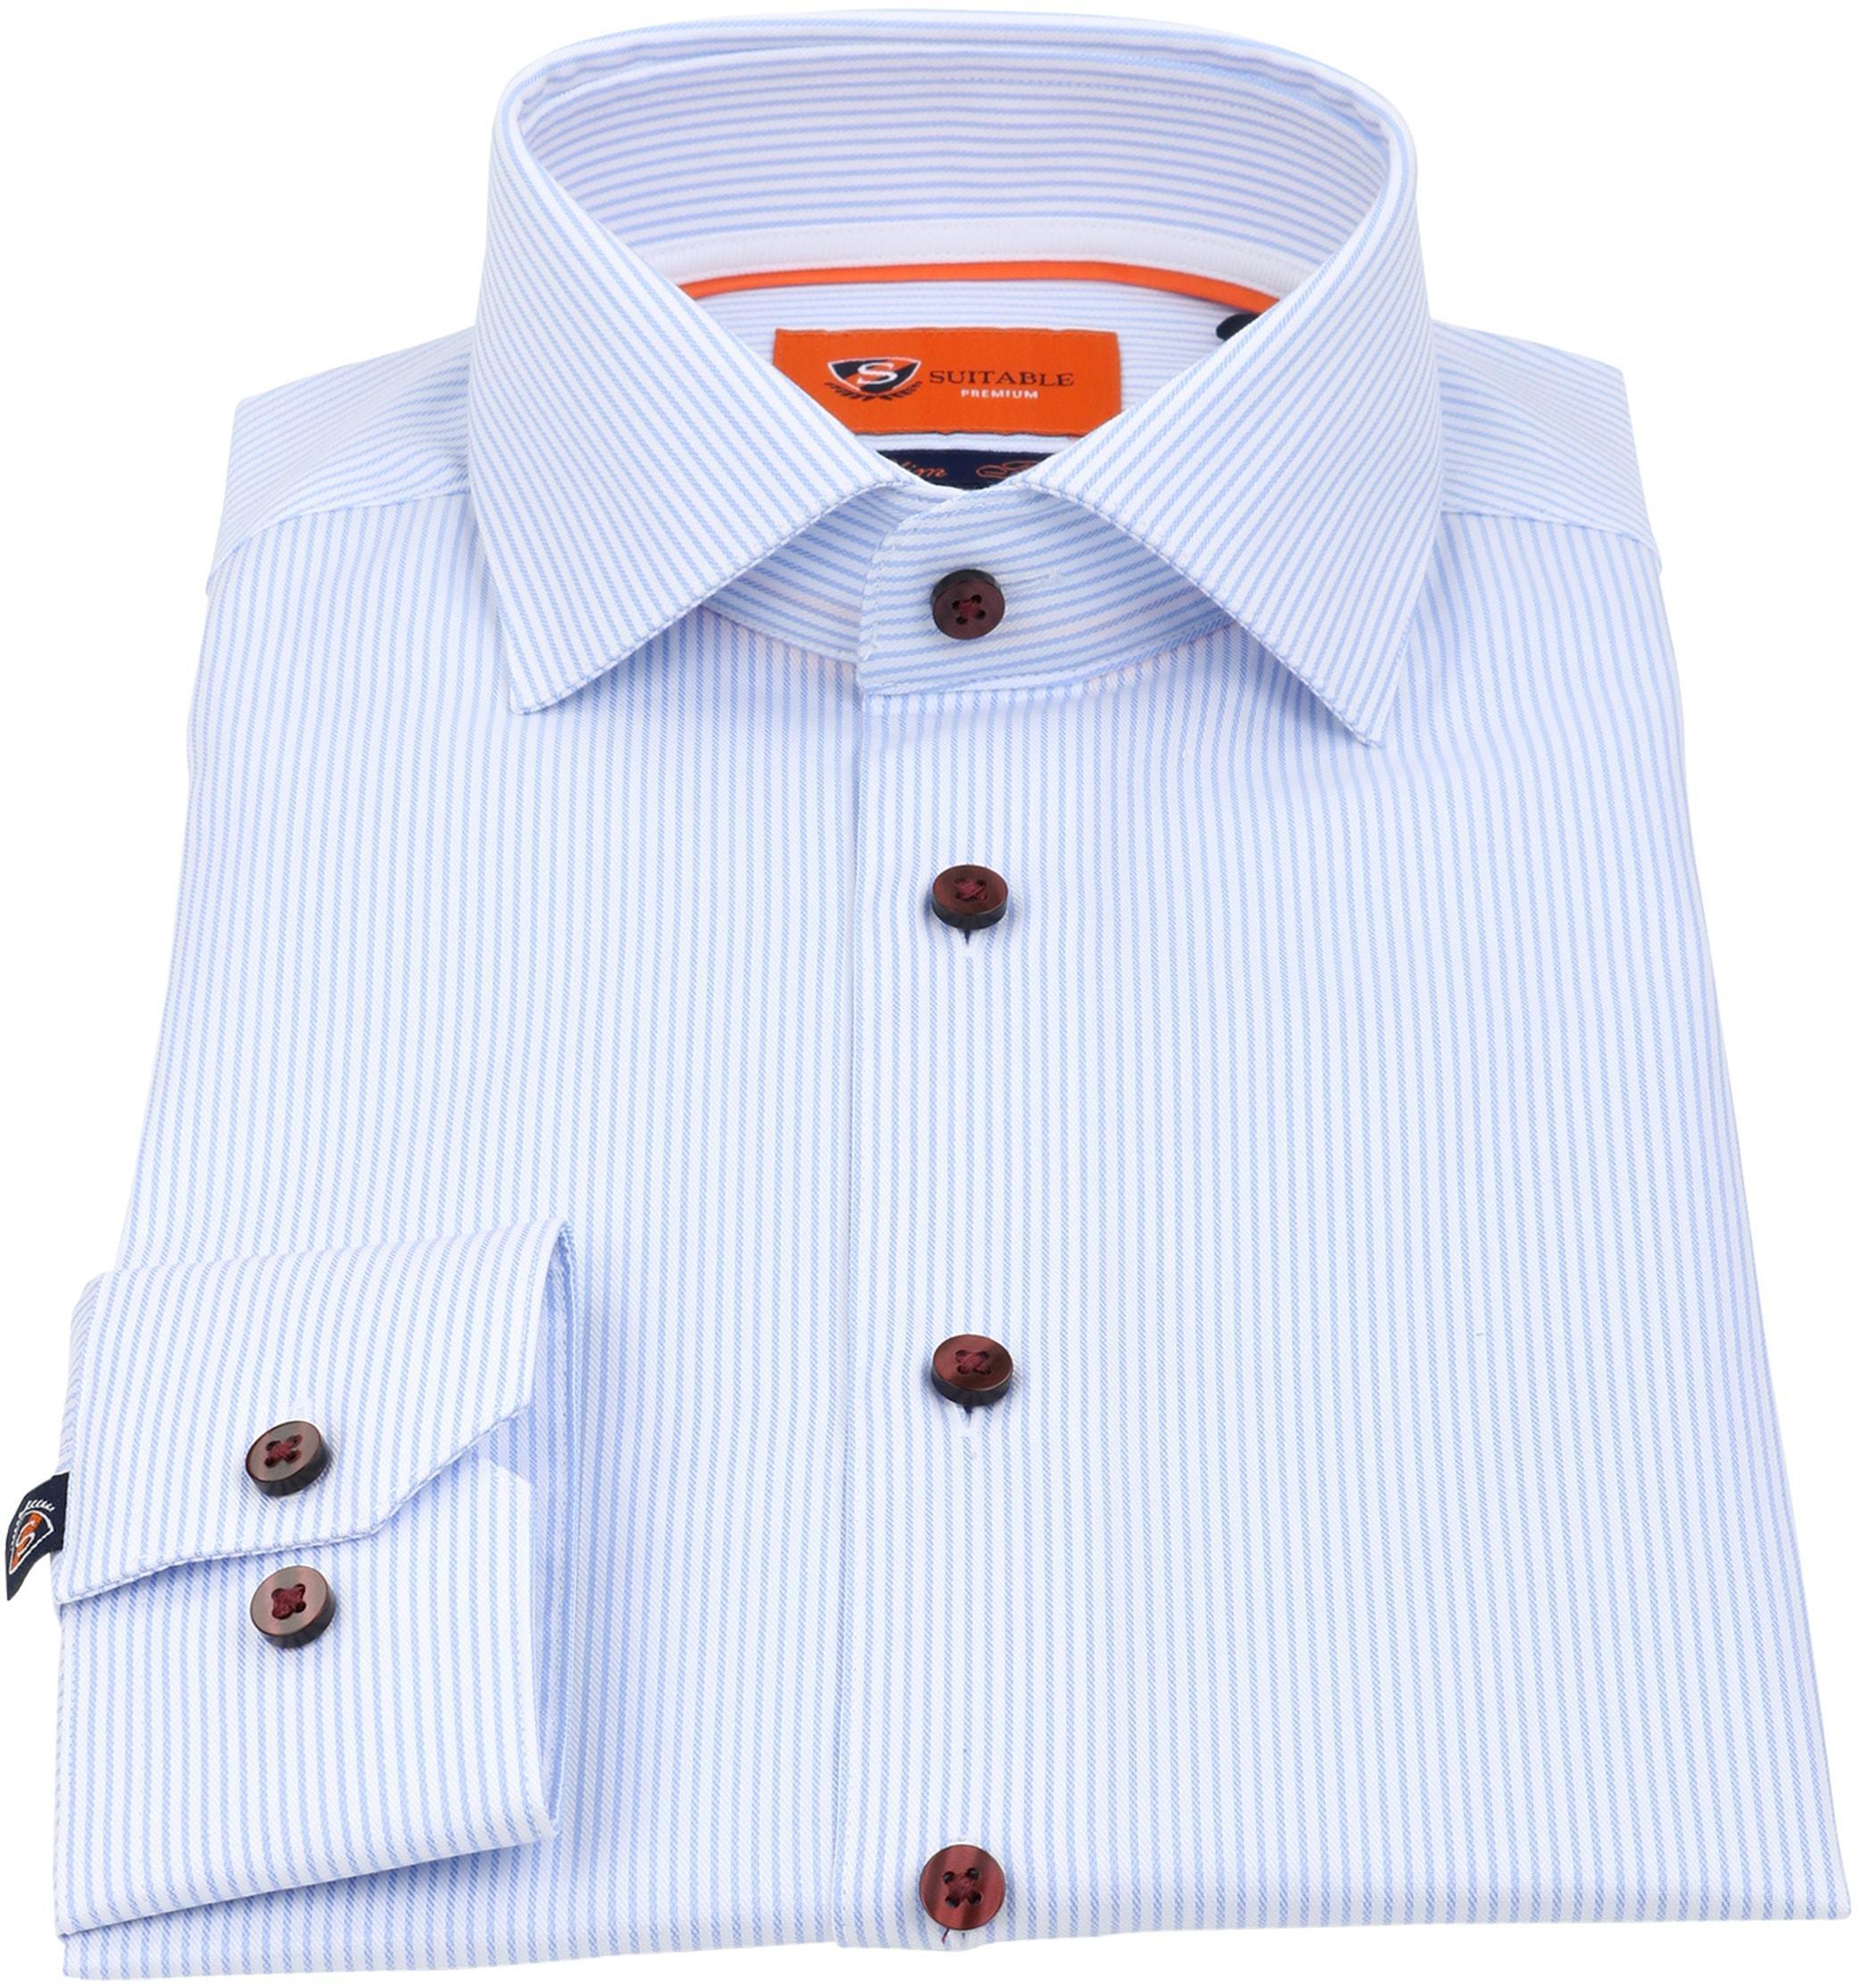 Suitable Overhemd Cotelet Blauw foto 1